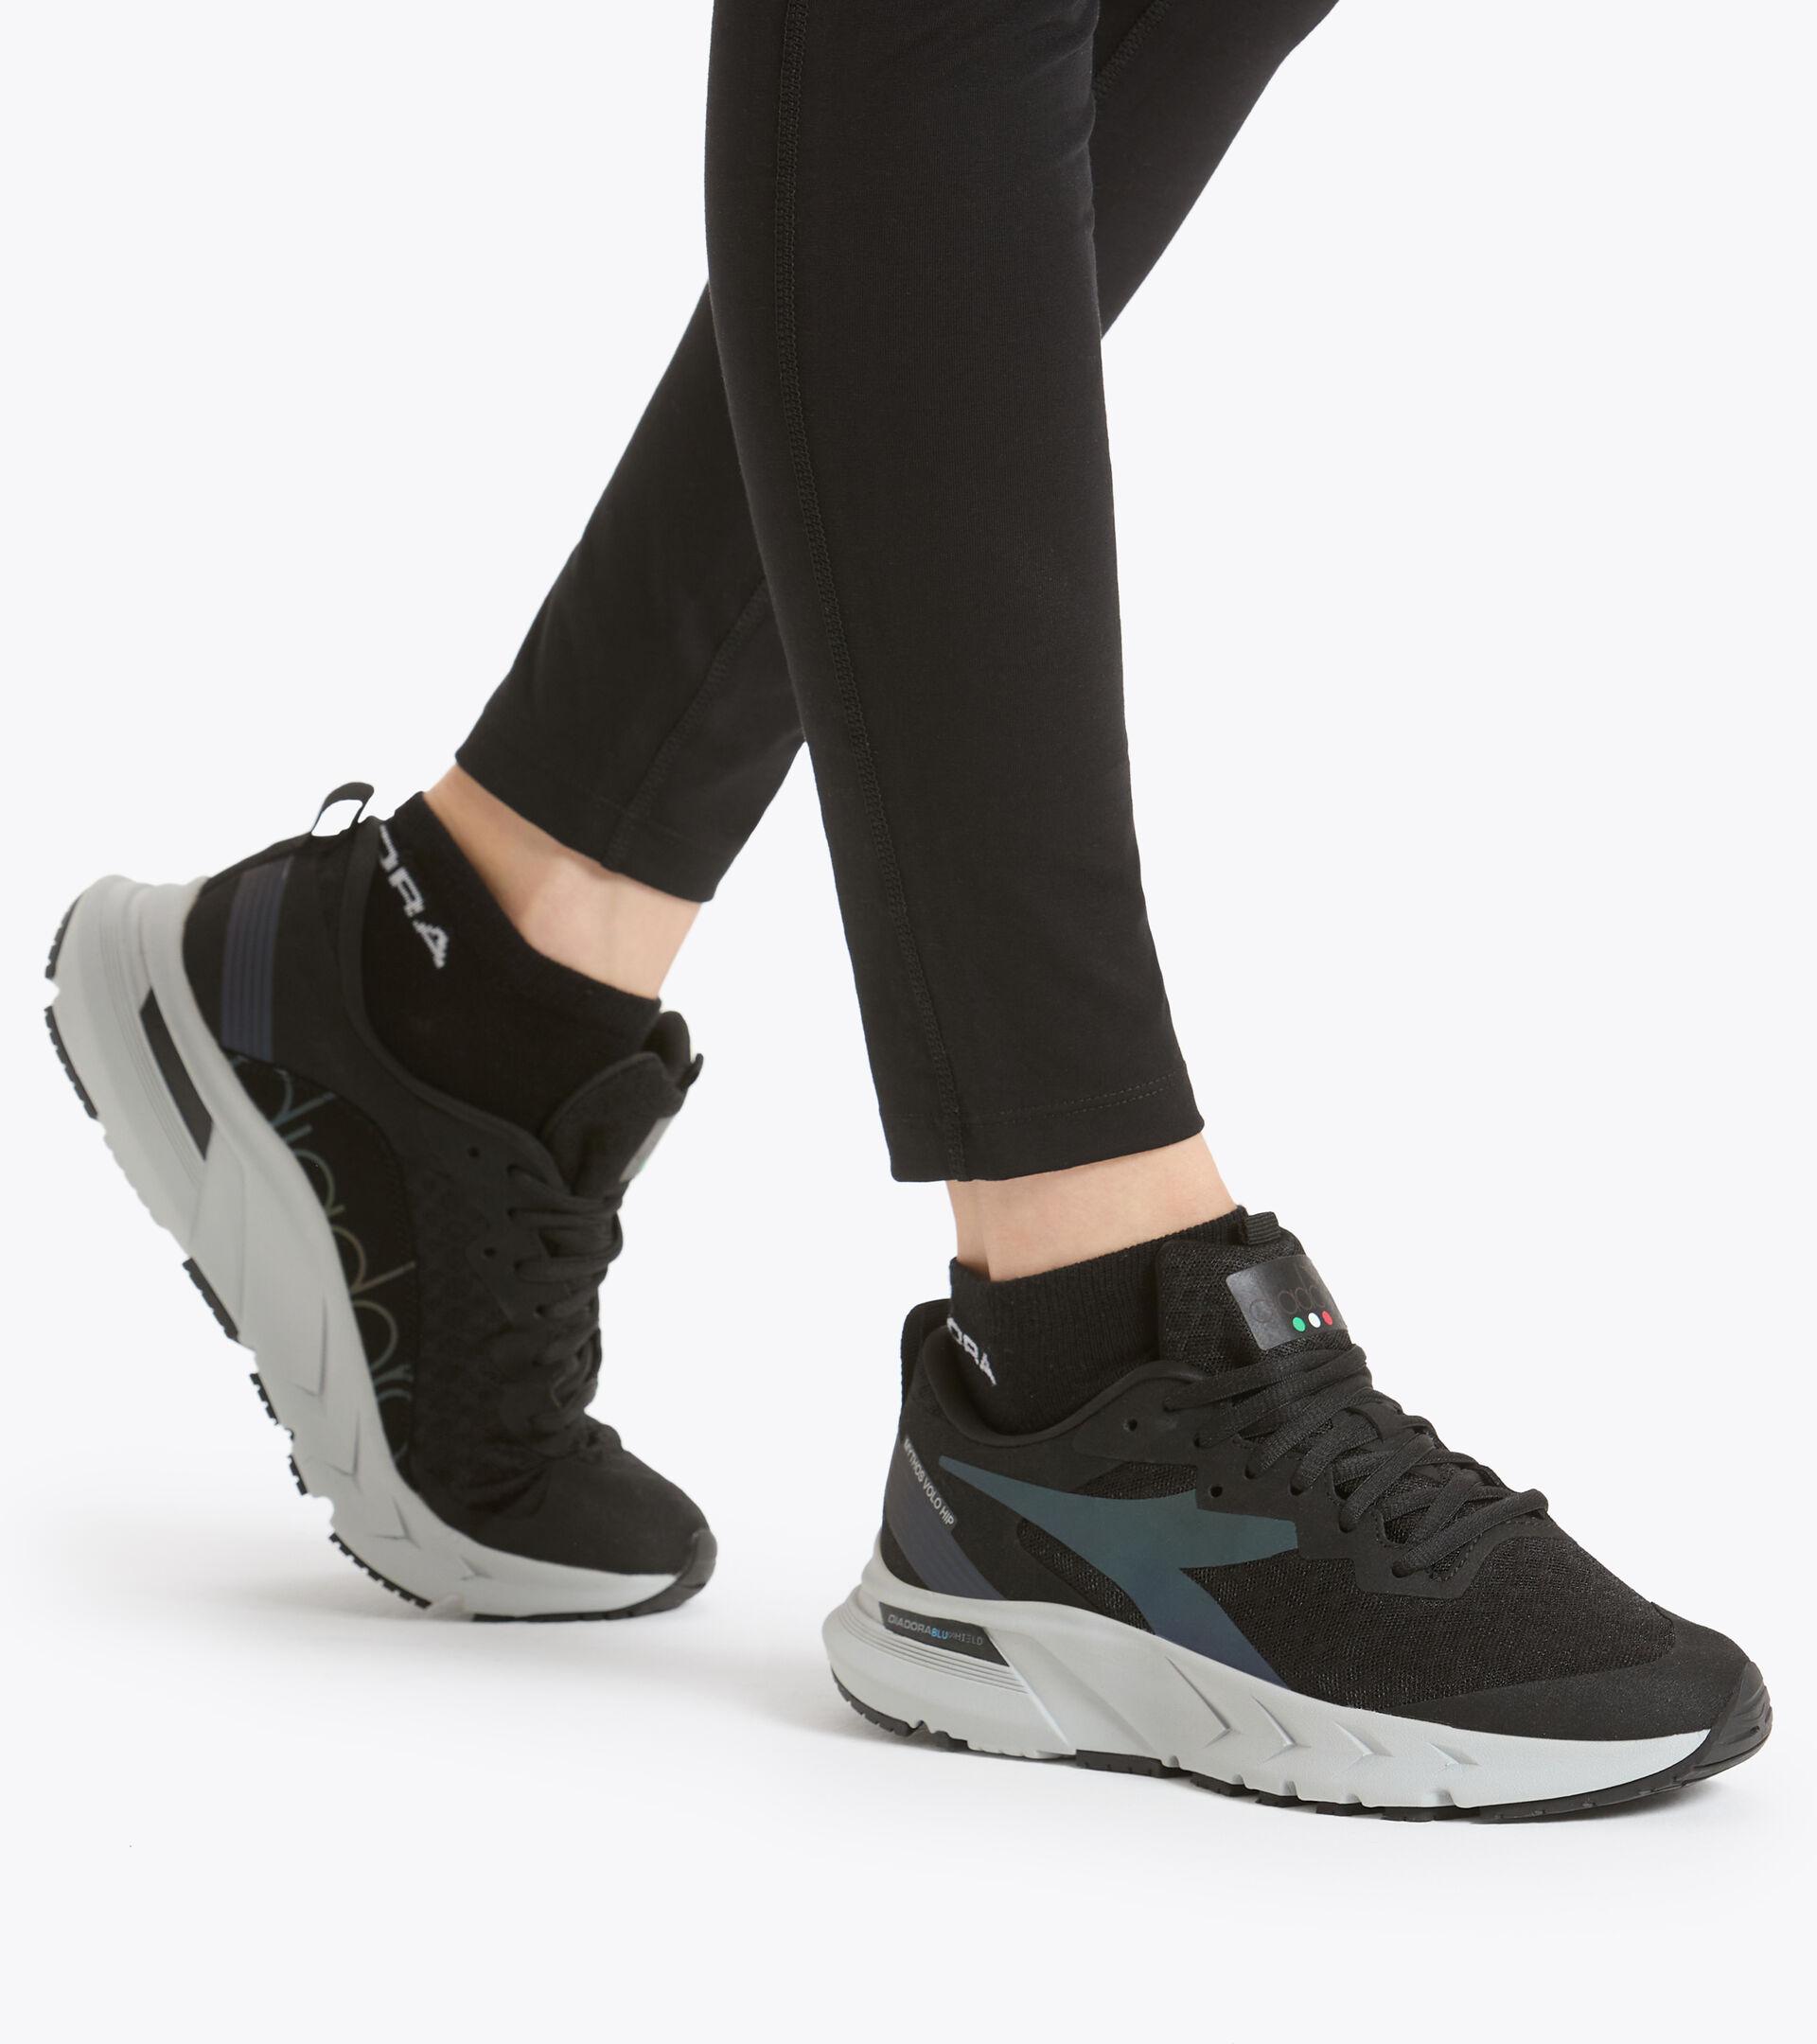 Footwear Sport DONNA MYTHOS BLUSHIELD VOLO HIP W NERO/ARGENTO Diadora